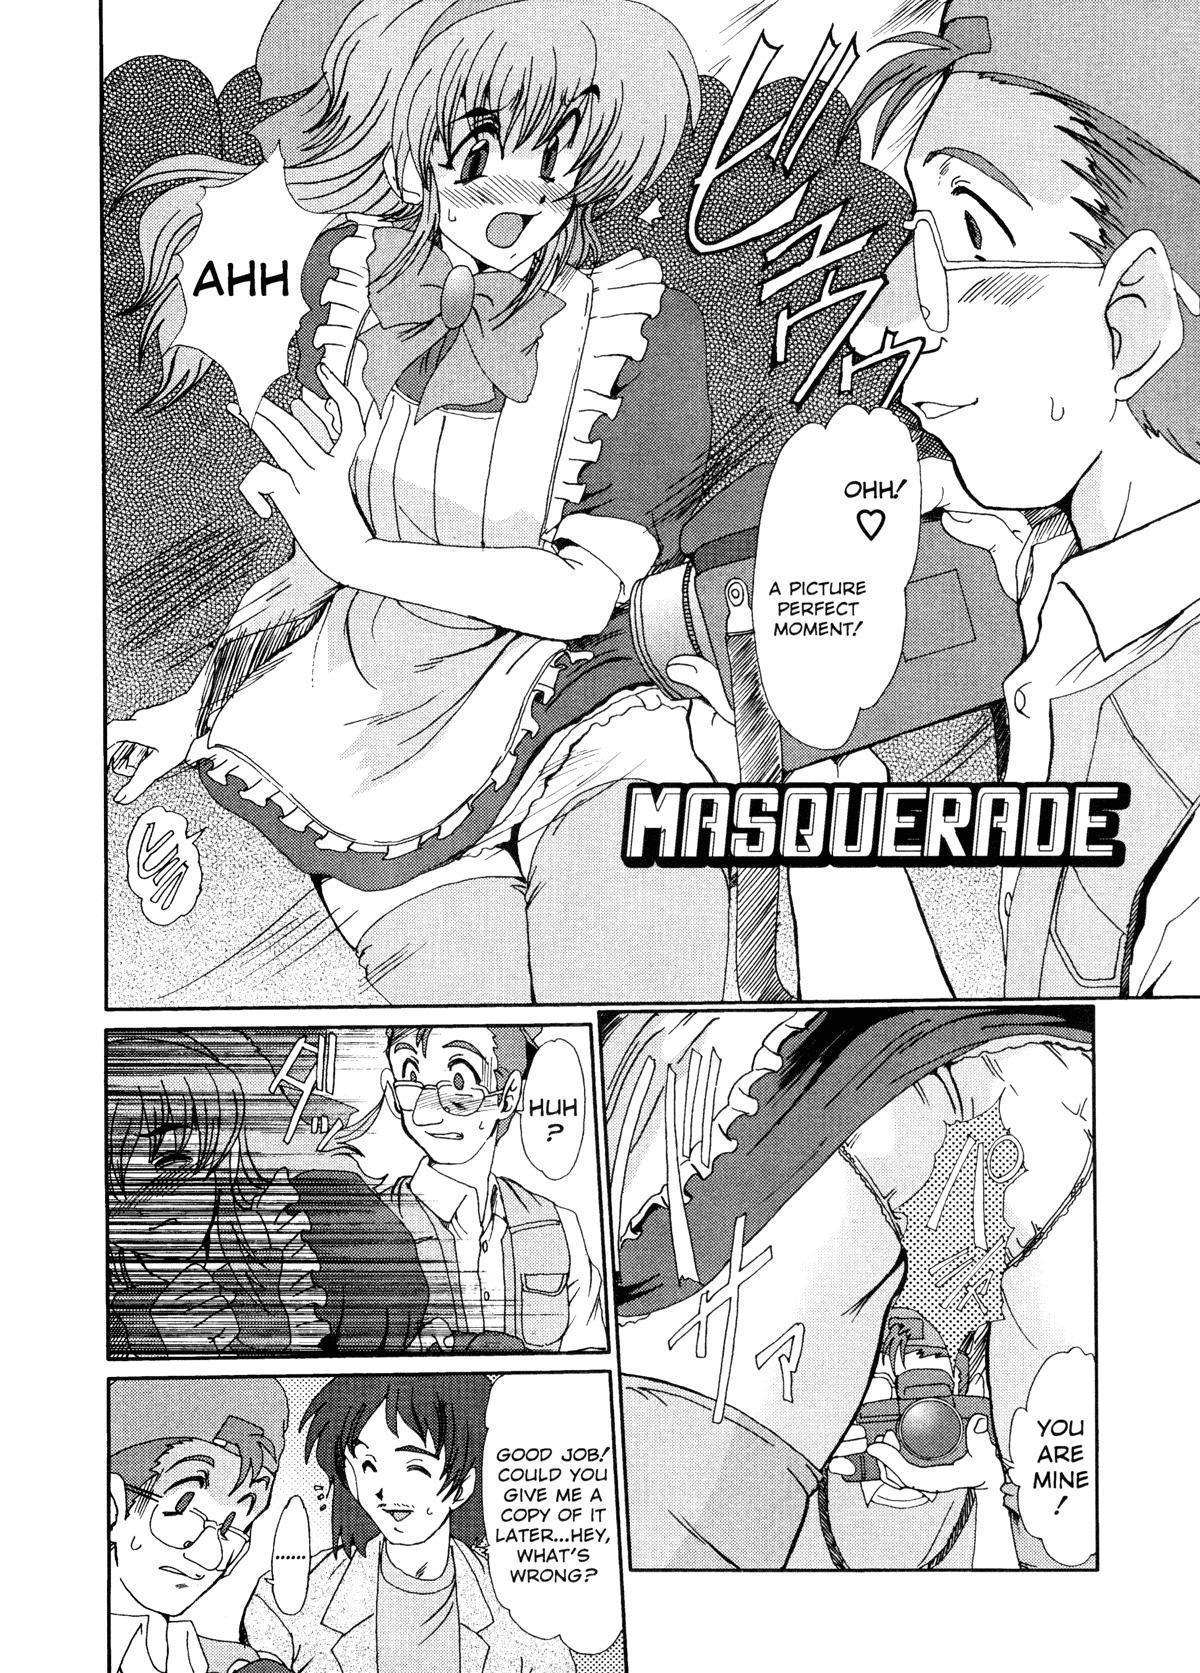 Masquerade 101